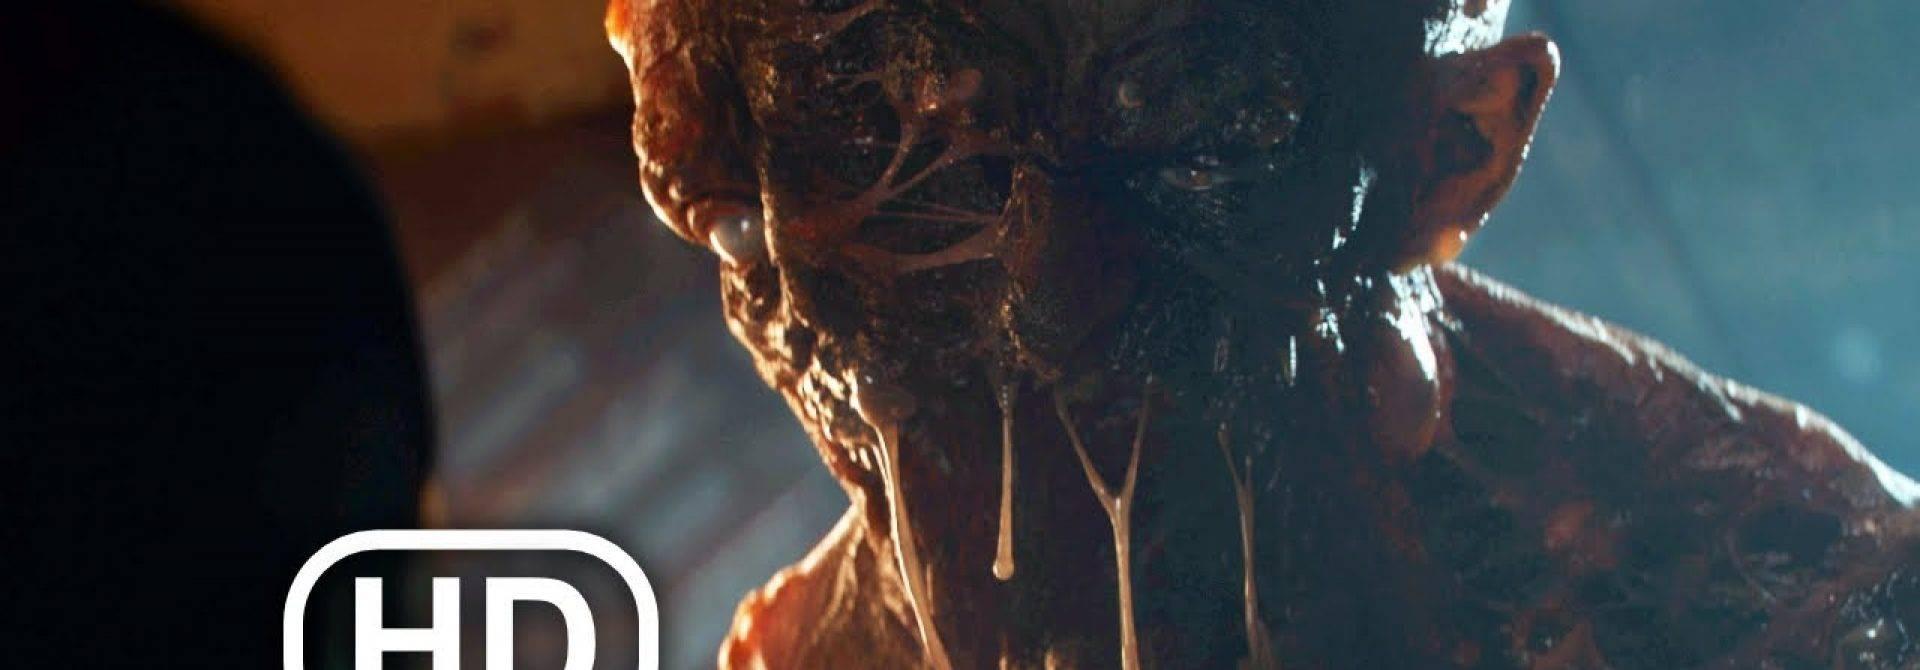 The Callisto Protocol announced at Game awards